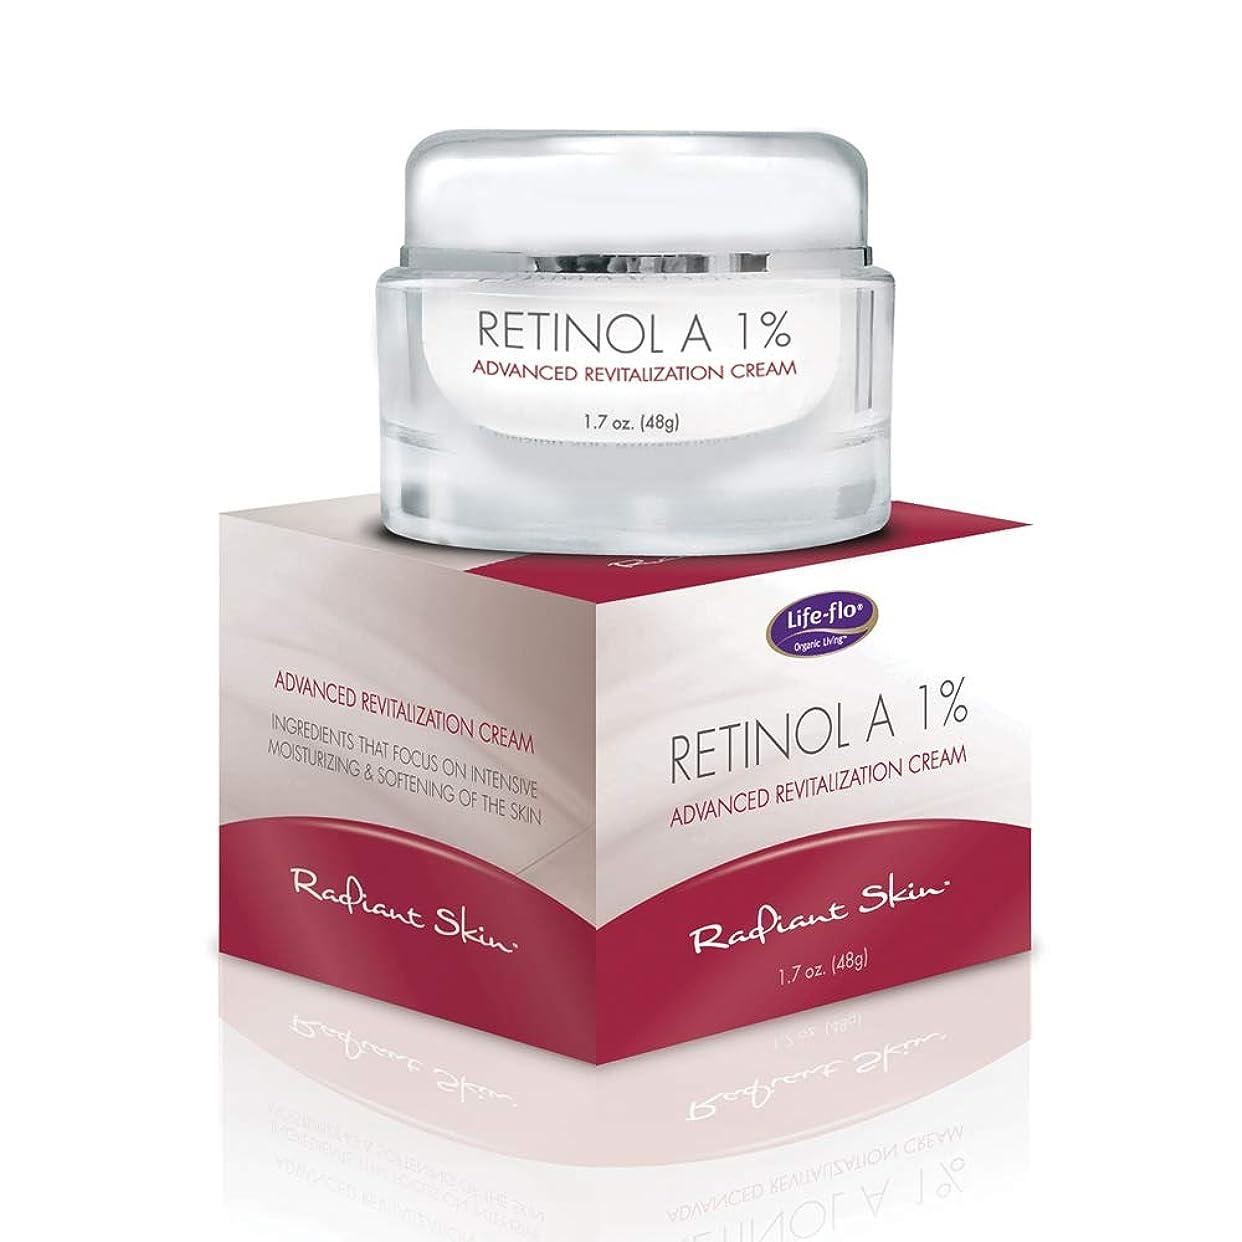 気性会話郵便物Retinol A 1%, Advanced Revitalization Cream, 1.7 oz (48 g)